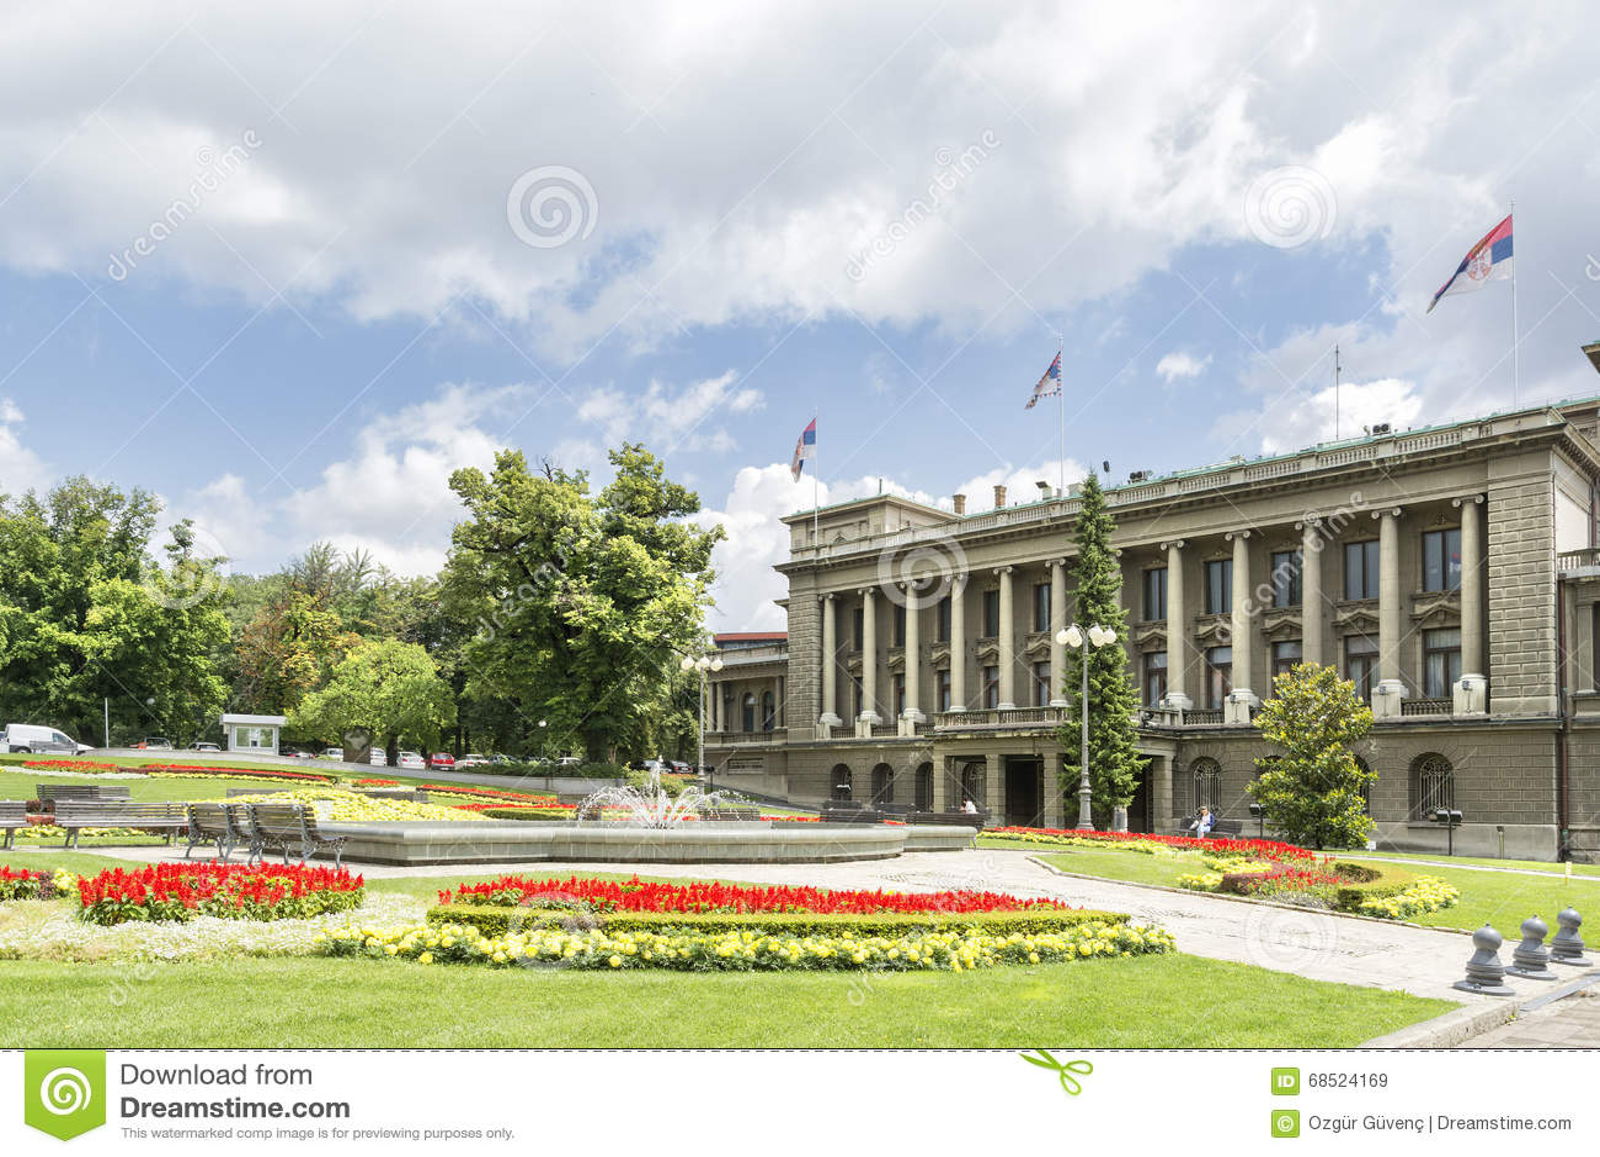 Stari Dvor (The Old Palace), Belgrade, Serbia